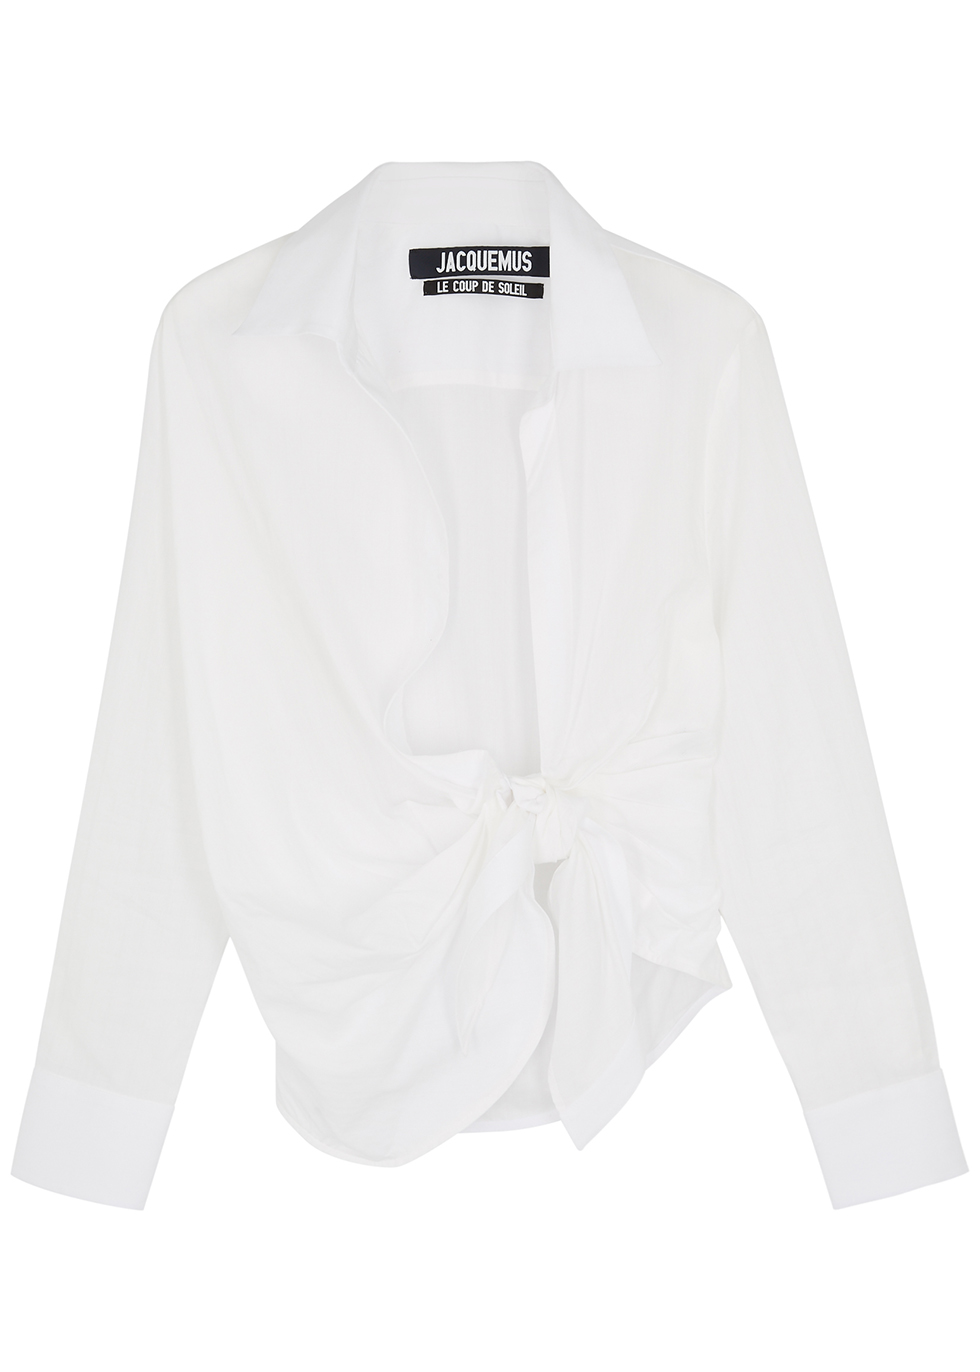 La Chemise Bahia white cotton shirt